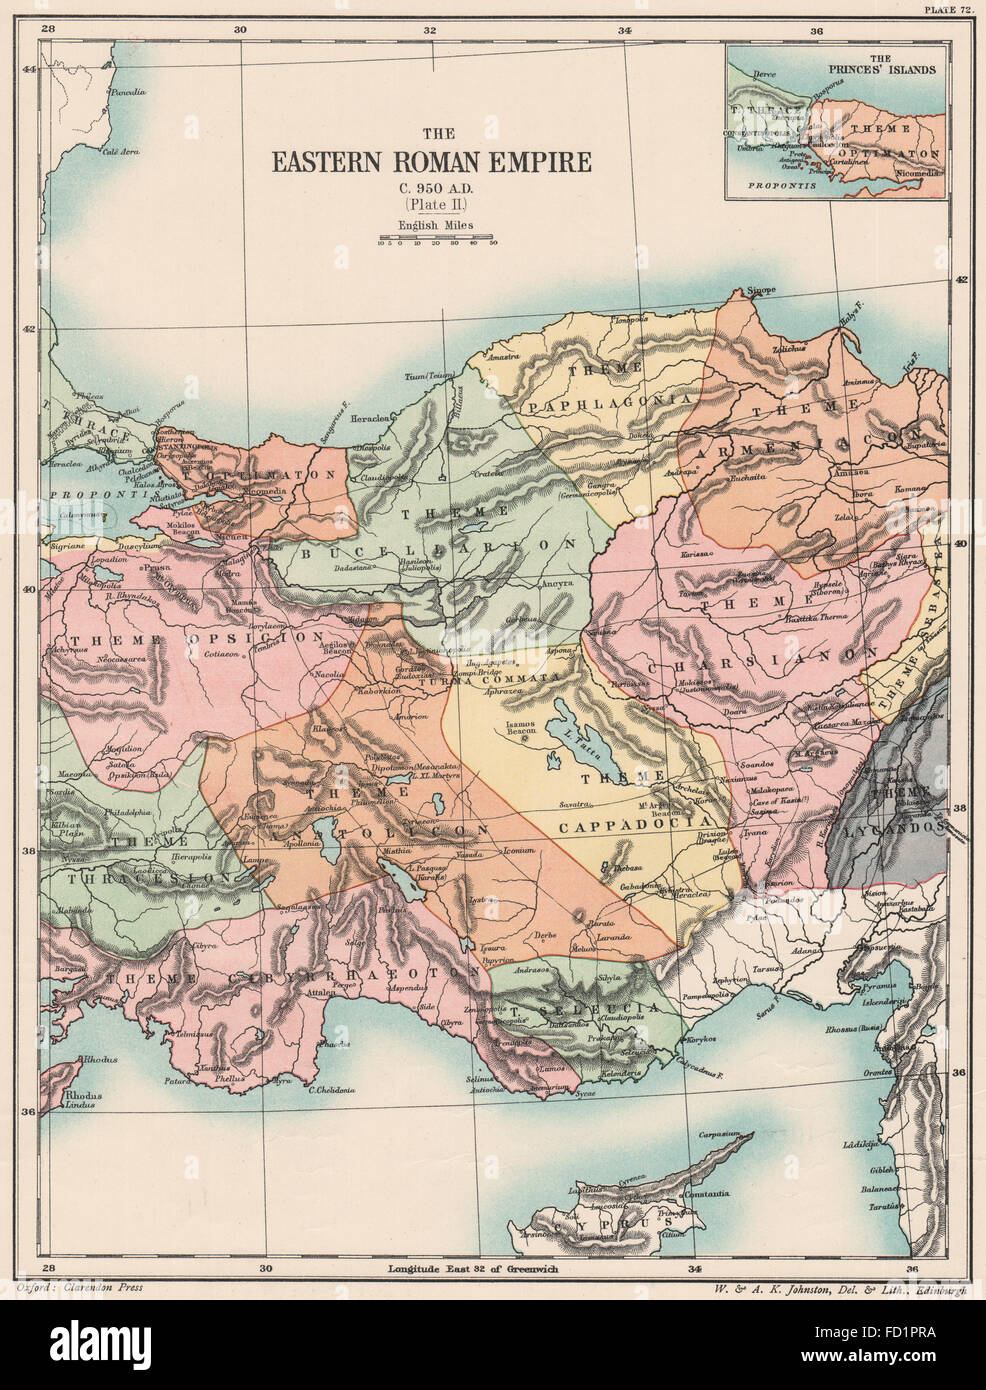 C'est de l'EMPIRE ROMAIN950 AD:Empire Byzantin.Planche 2.L'Asie mineure, la Turquie carte 1902 Photo Stock